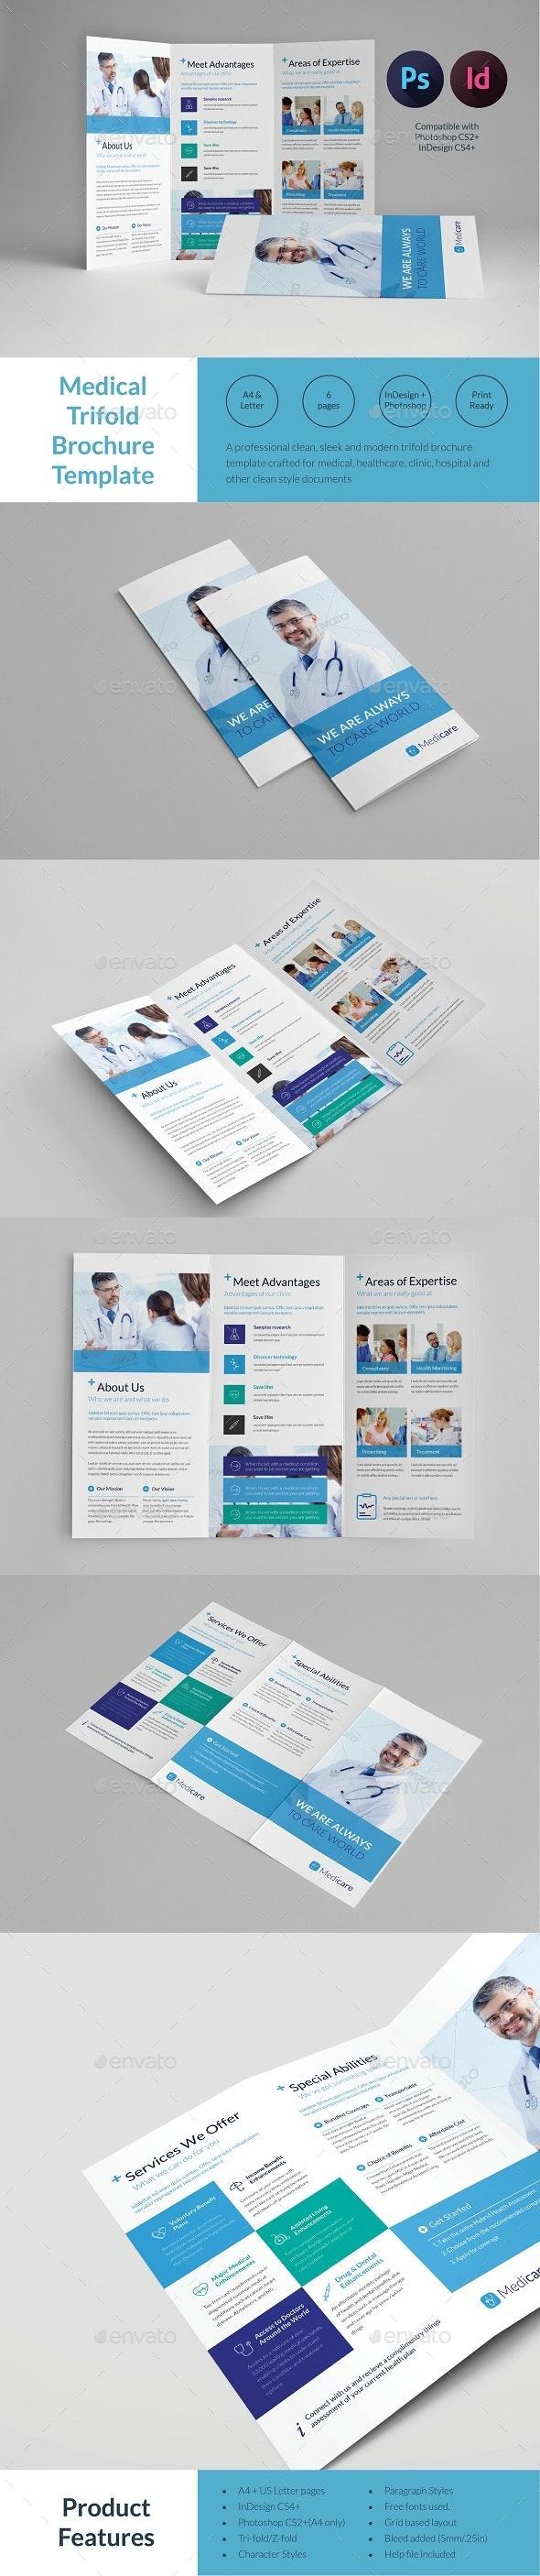 Medical Trifold Brochure Template - Informational Brochures